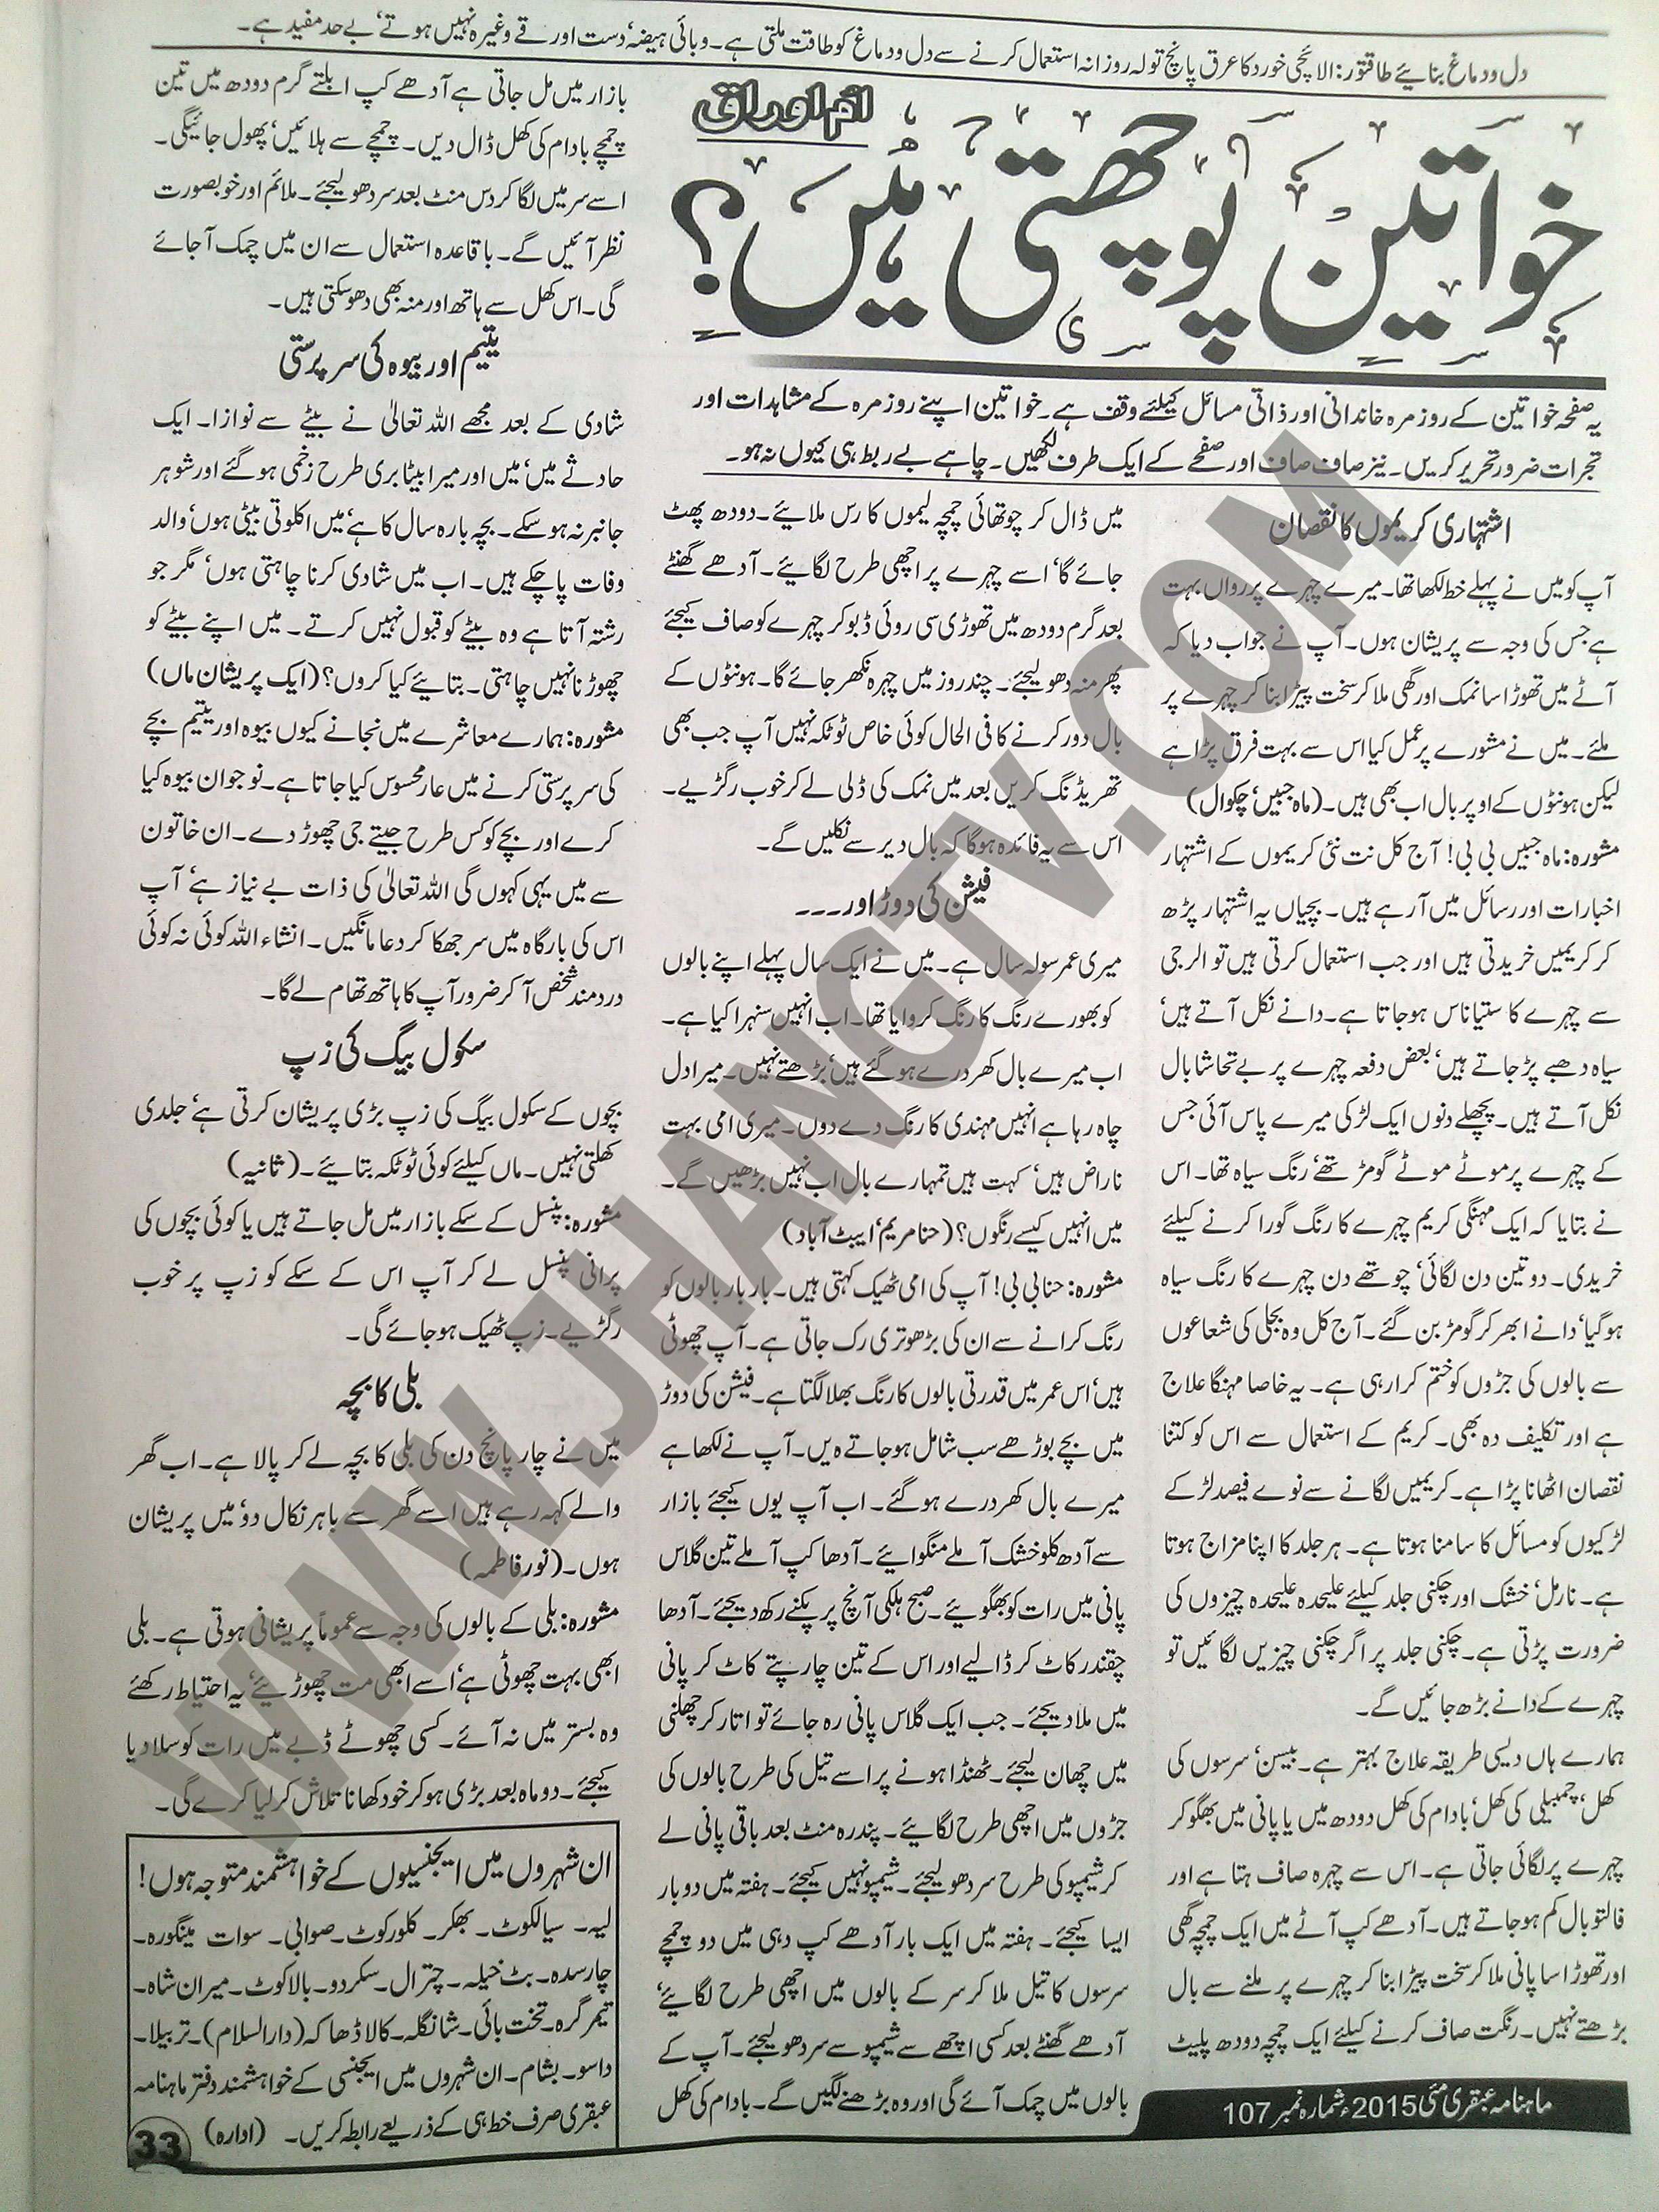 Ubqari May 2015 (31)